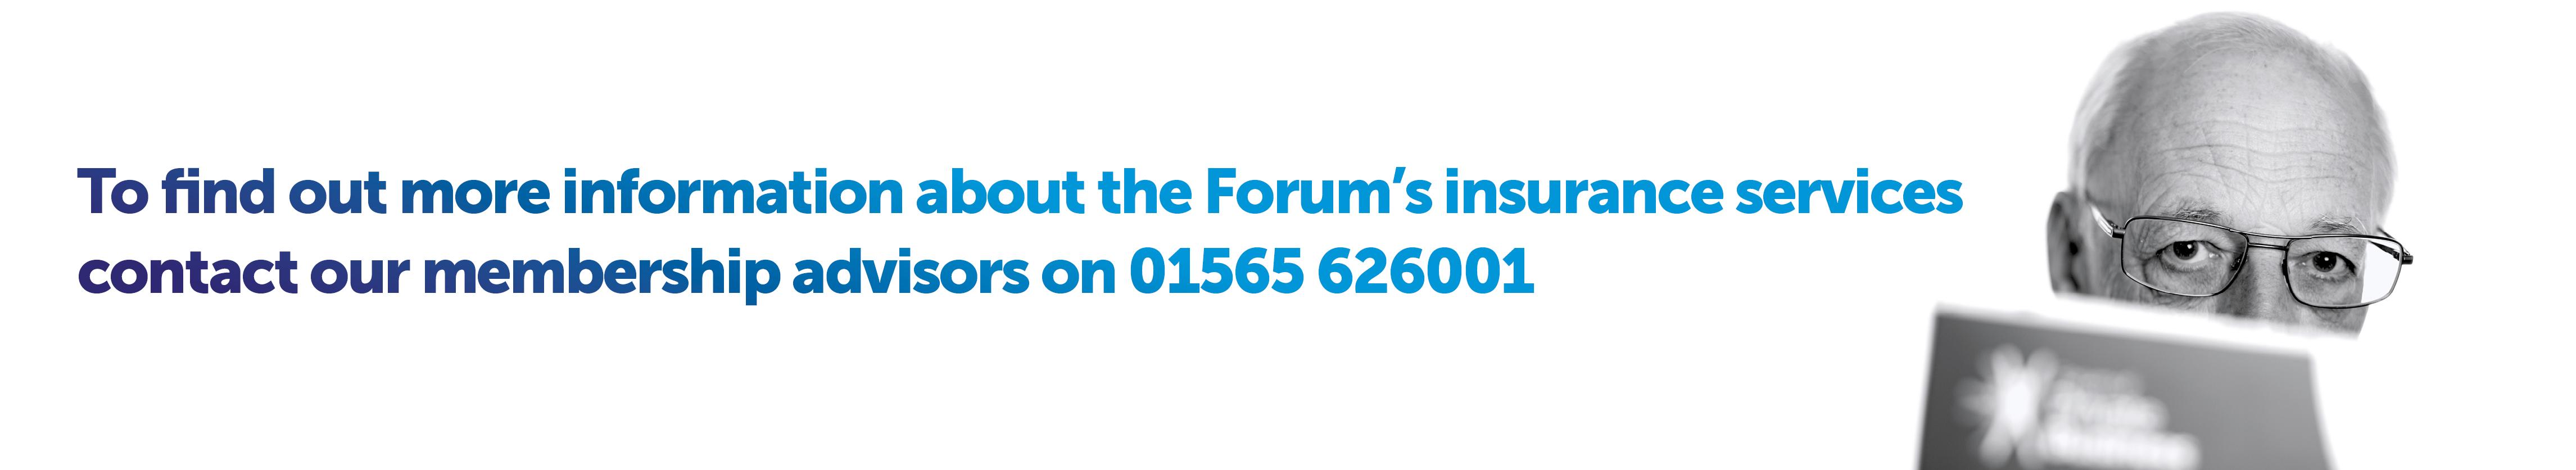 forum insurance service